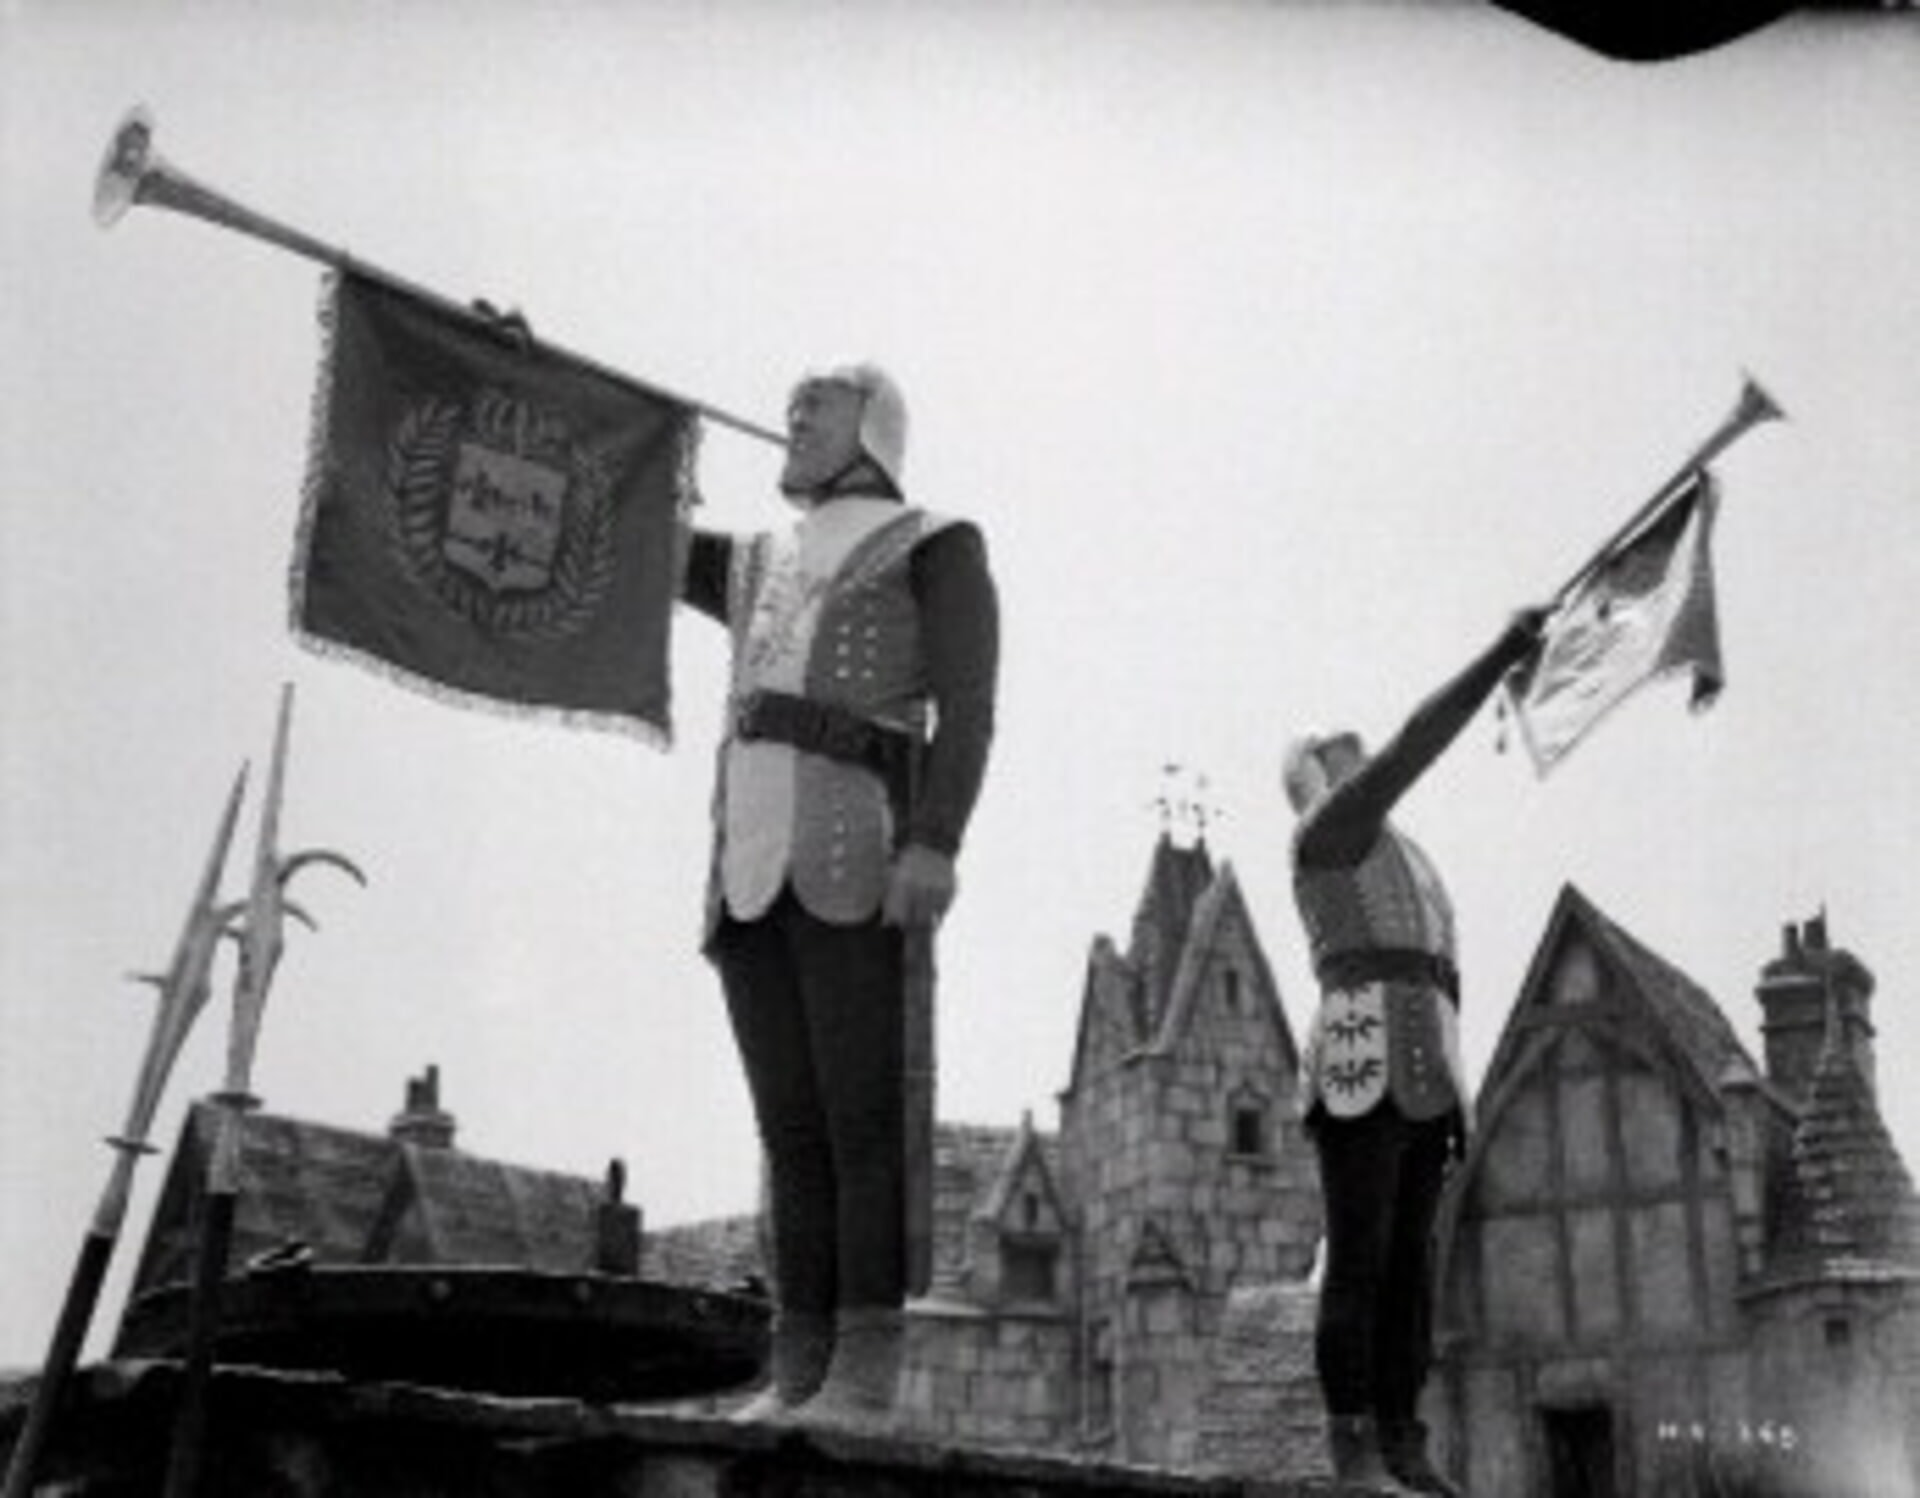 The Hunchback of Notre Dame - Image 6